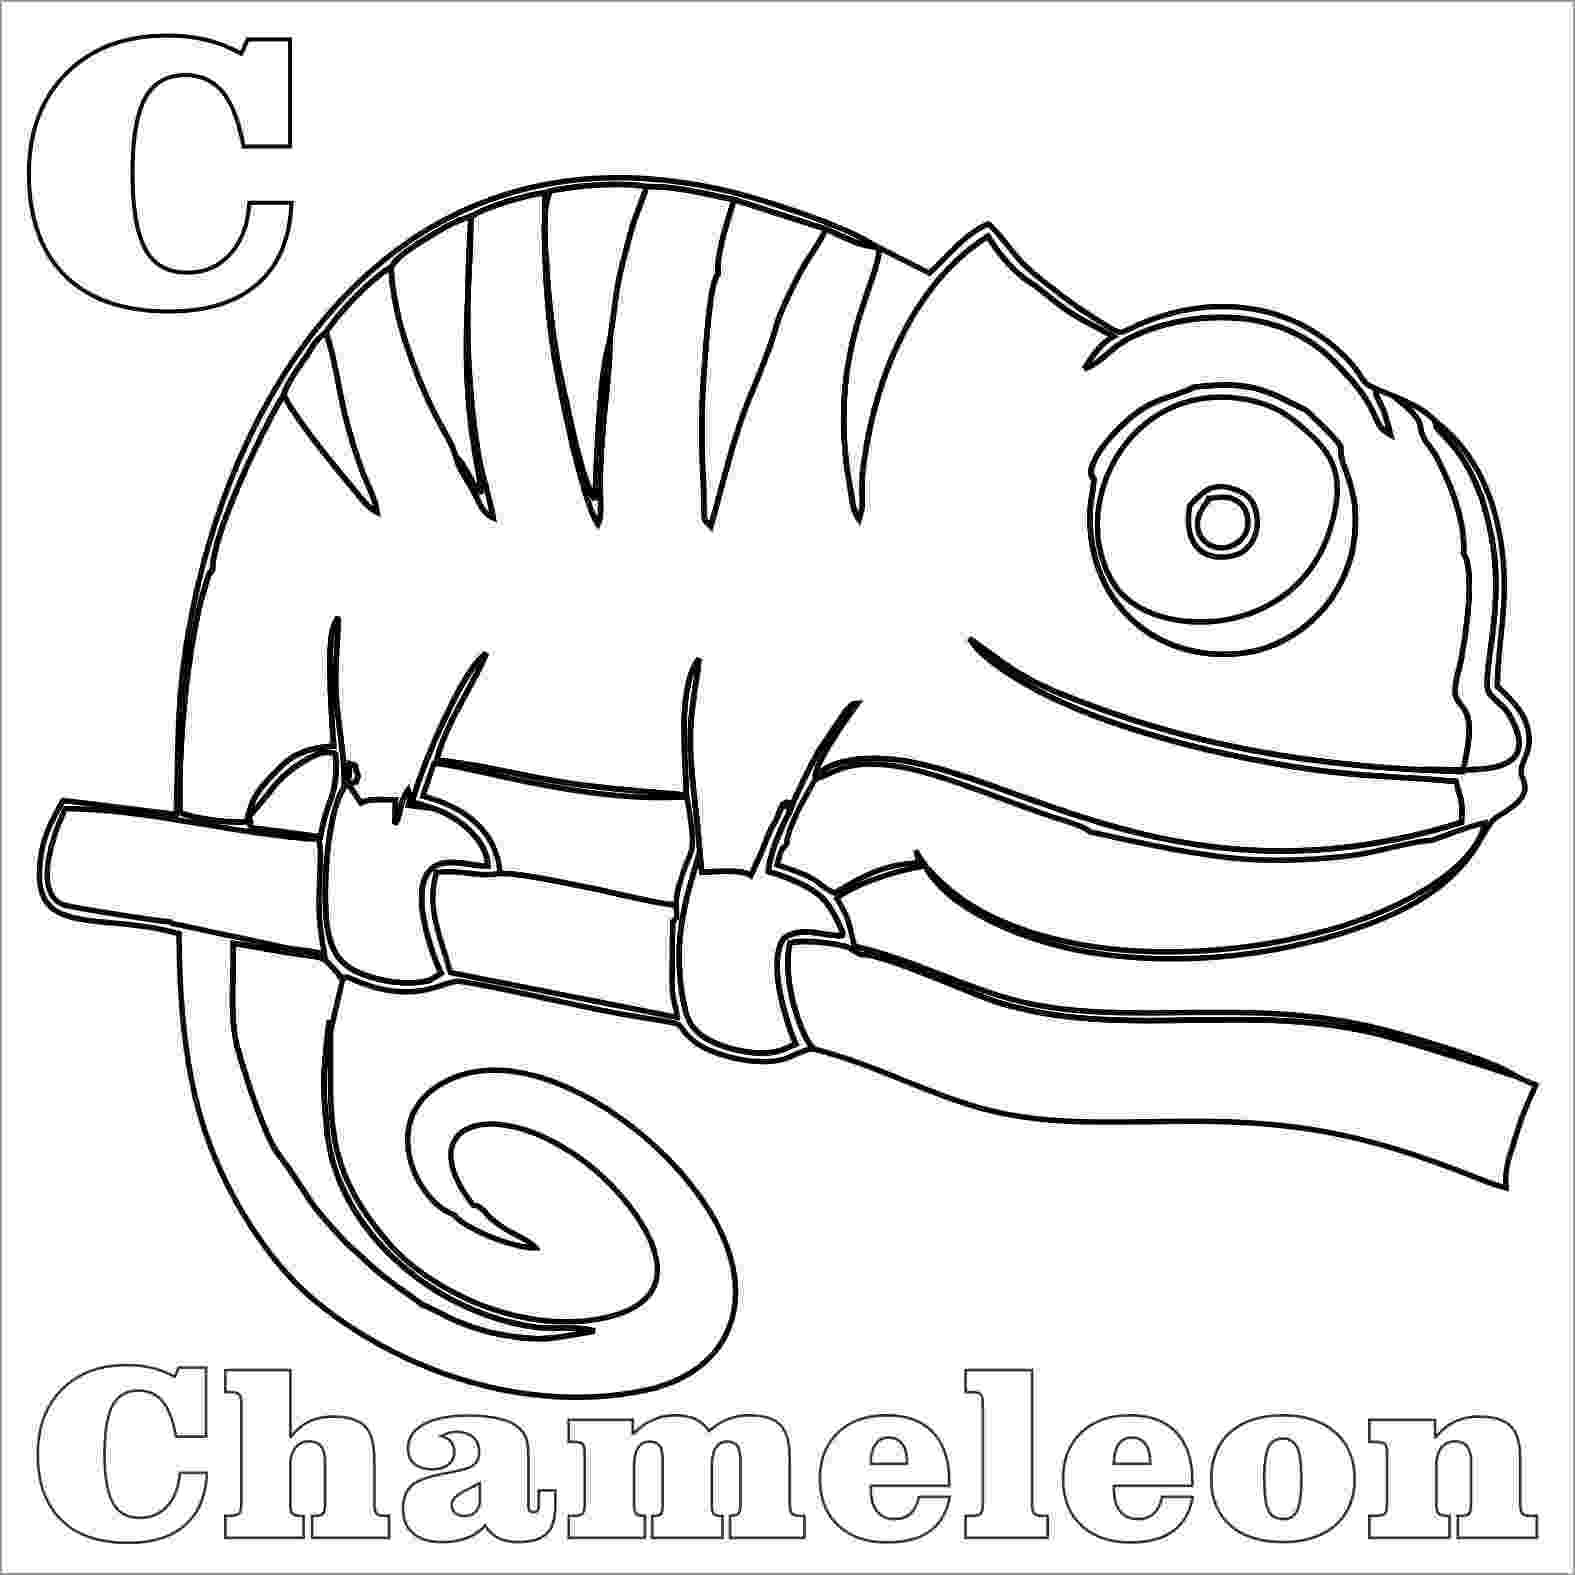 chameleon coloring pages chameleon coloring pages coloring chameleon pages